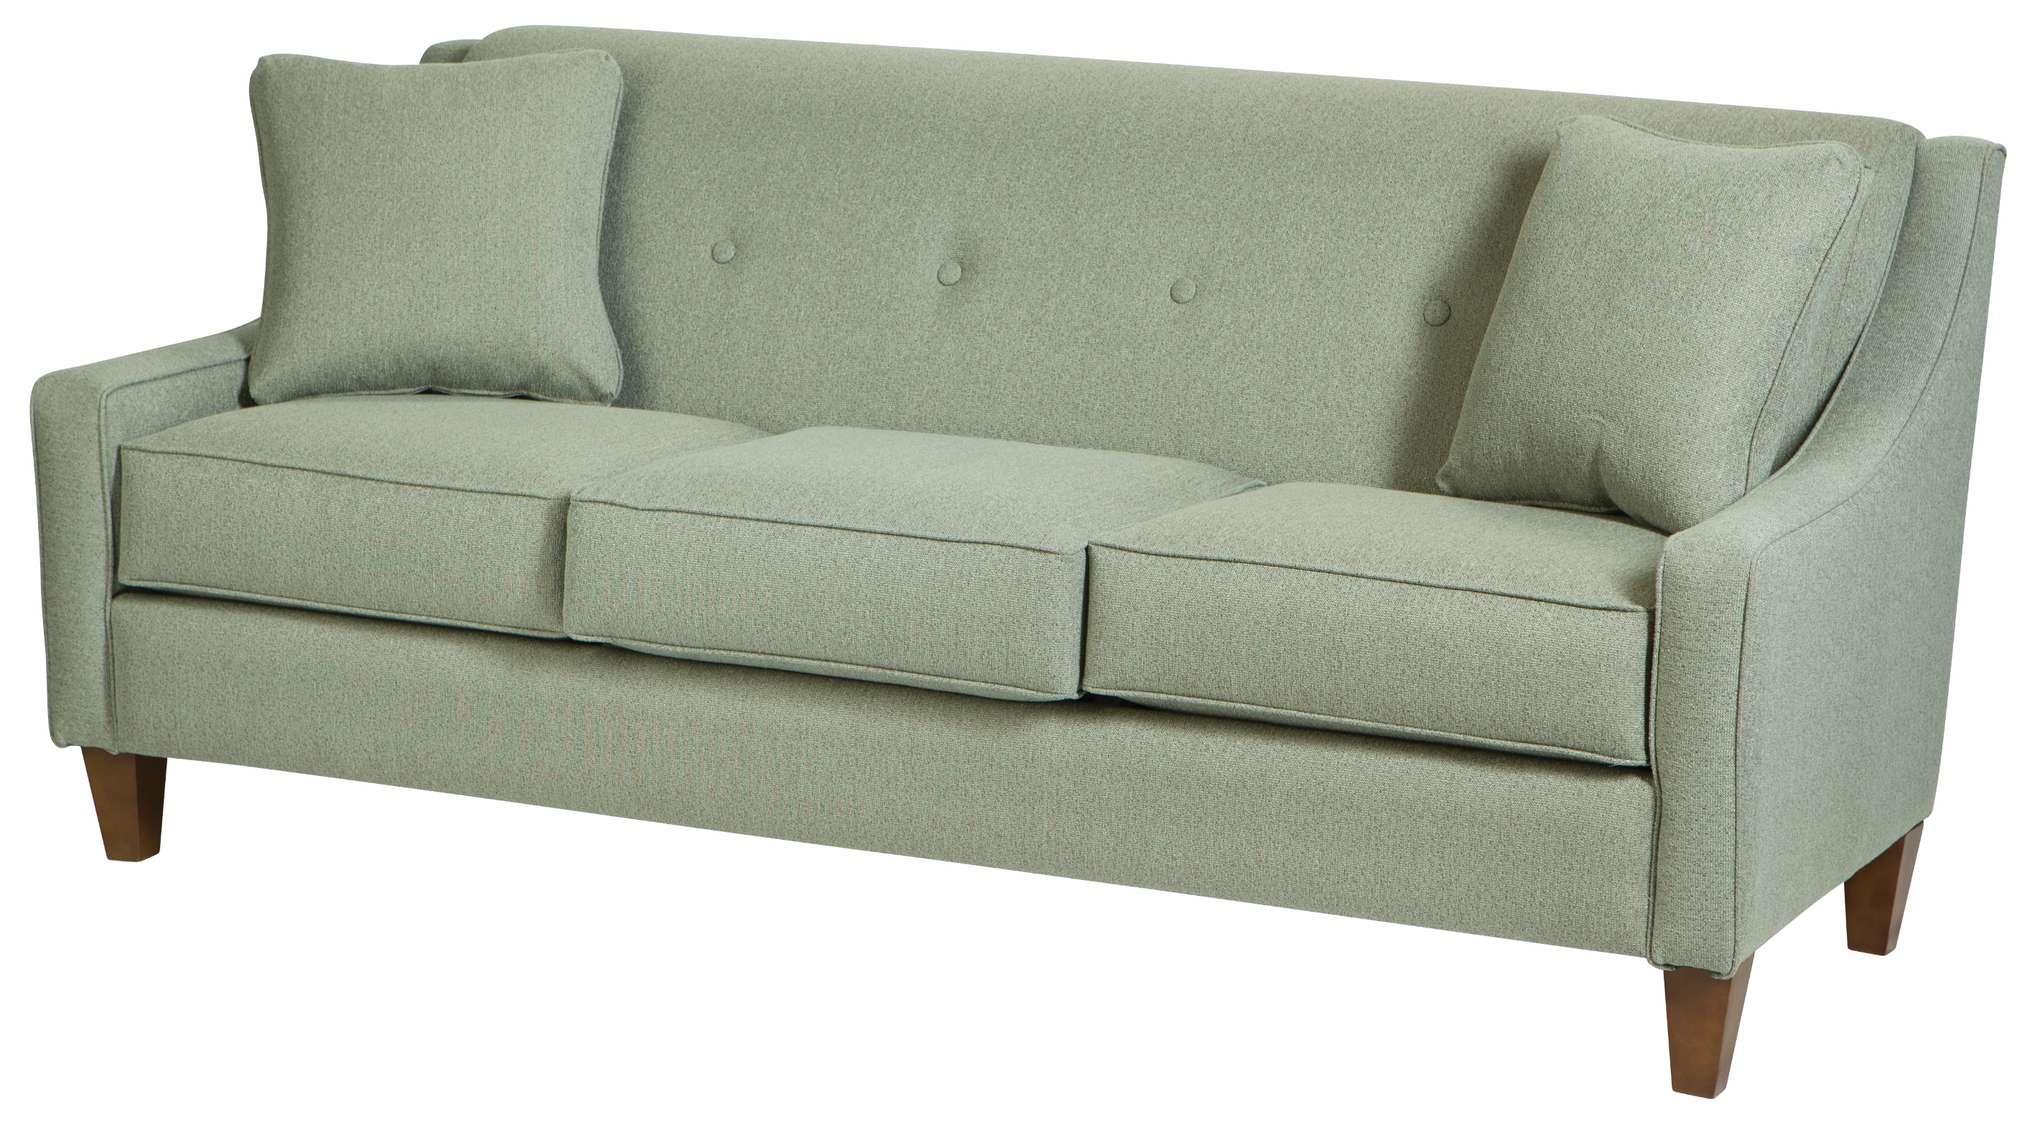 Vidalia Sofa In Crypton Fabric